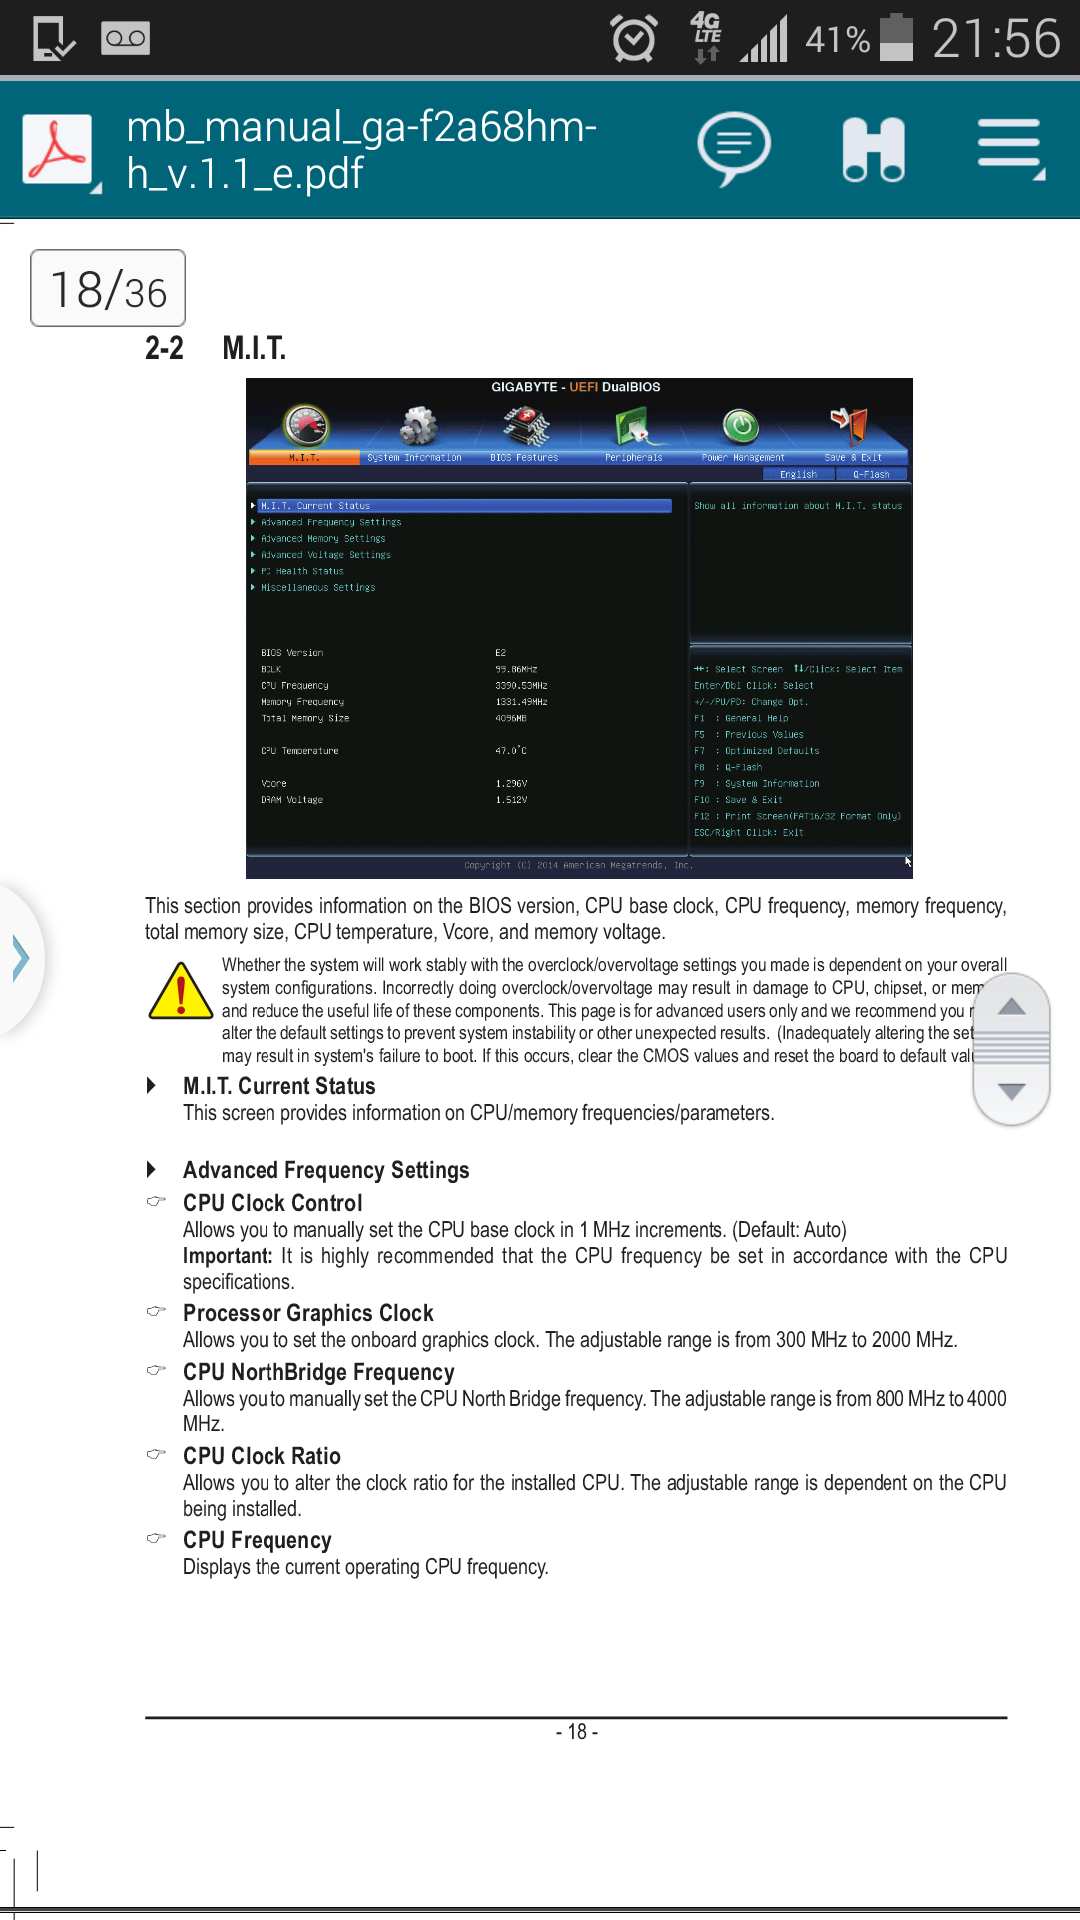 Screenshot_2018-08-22-21-56-53.png